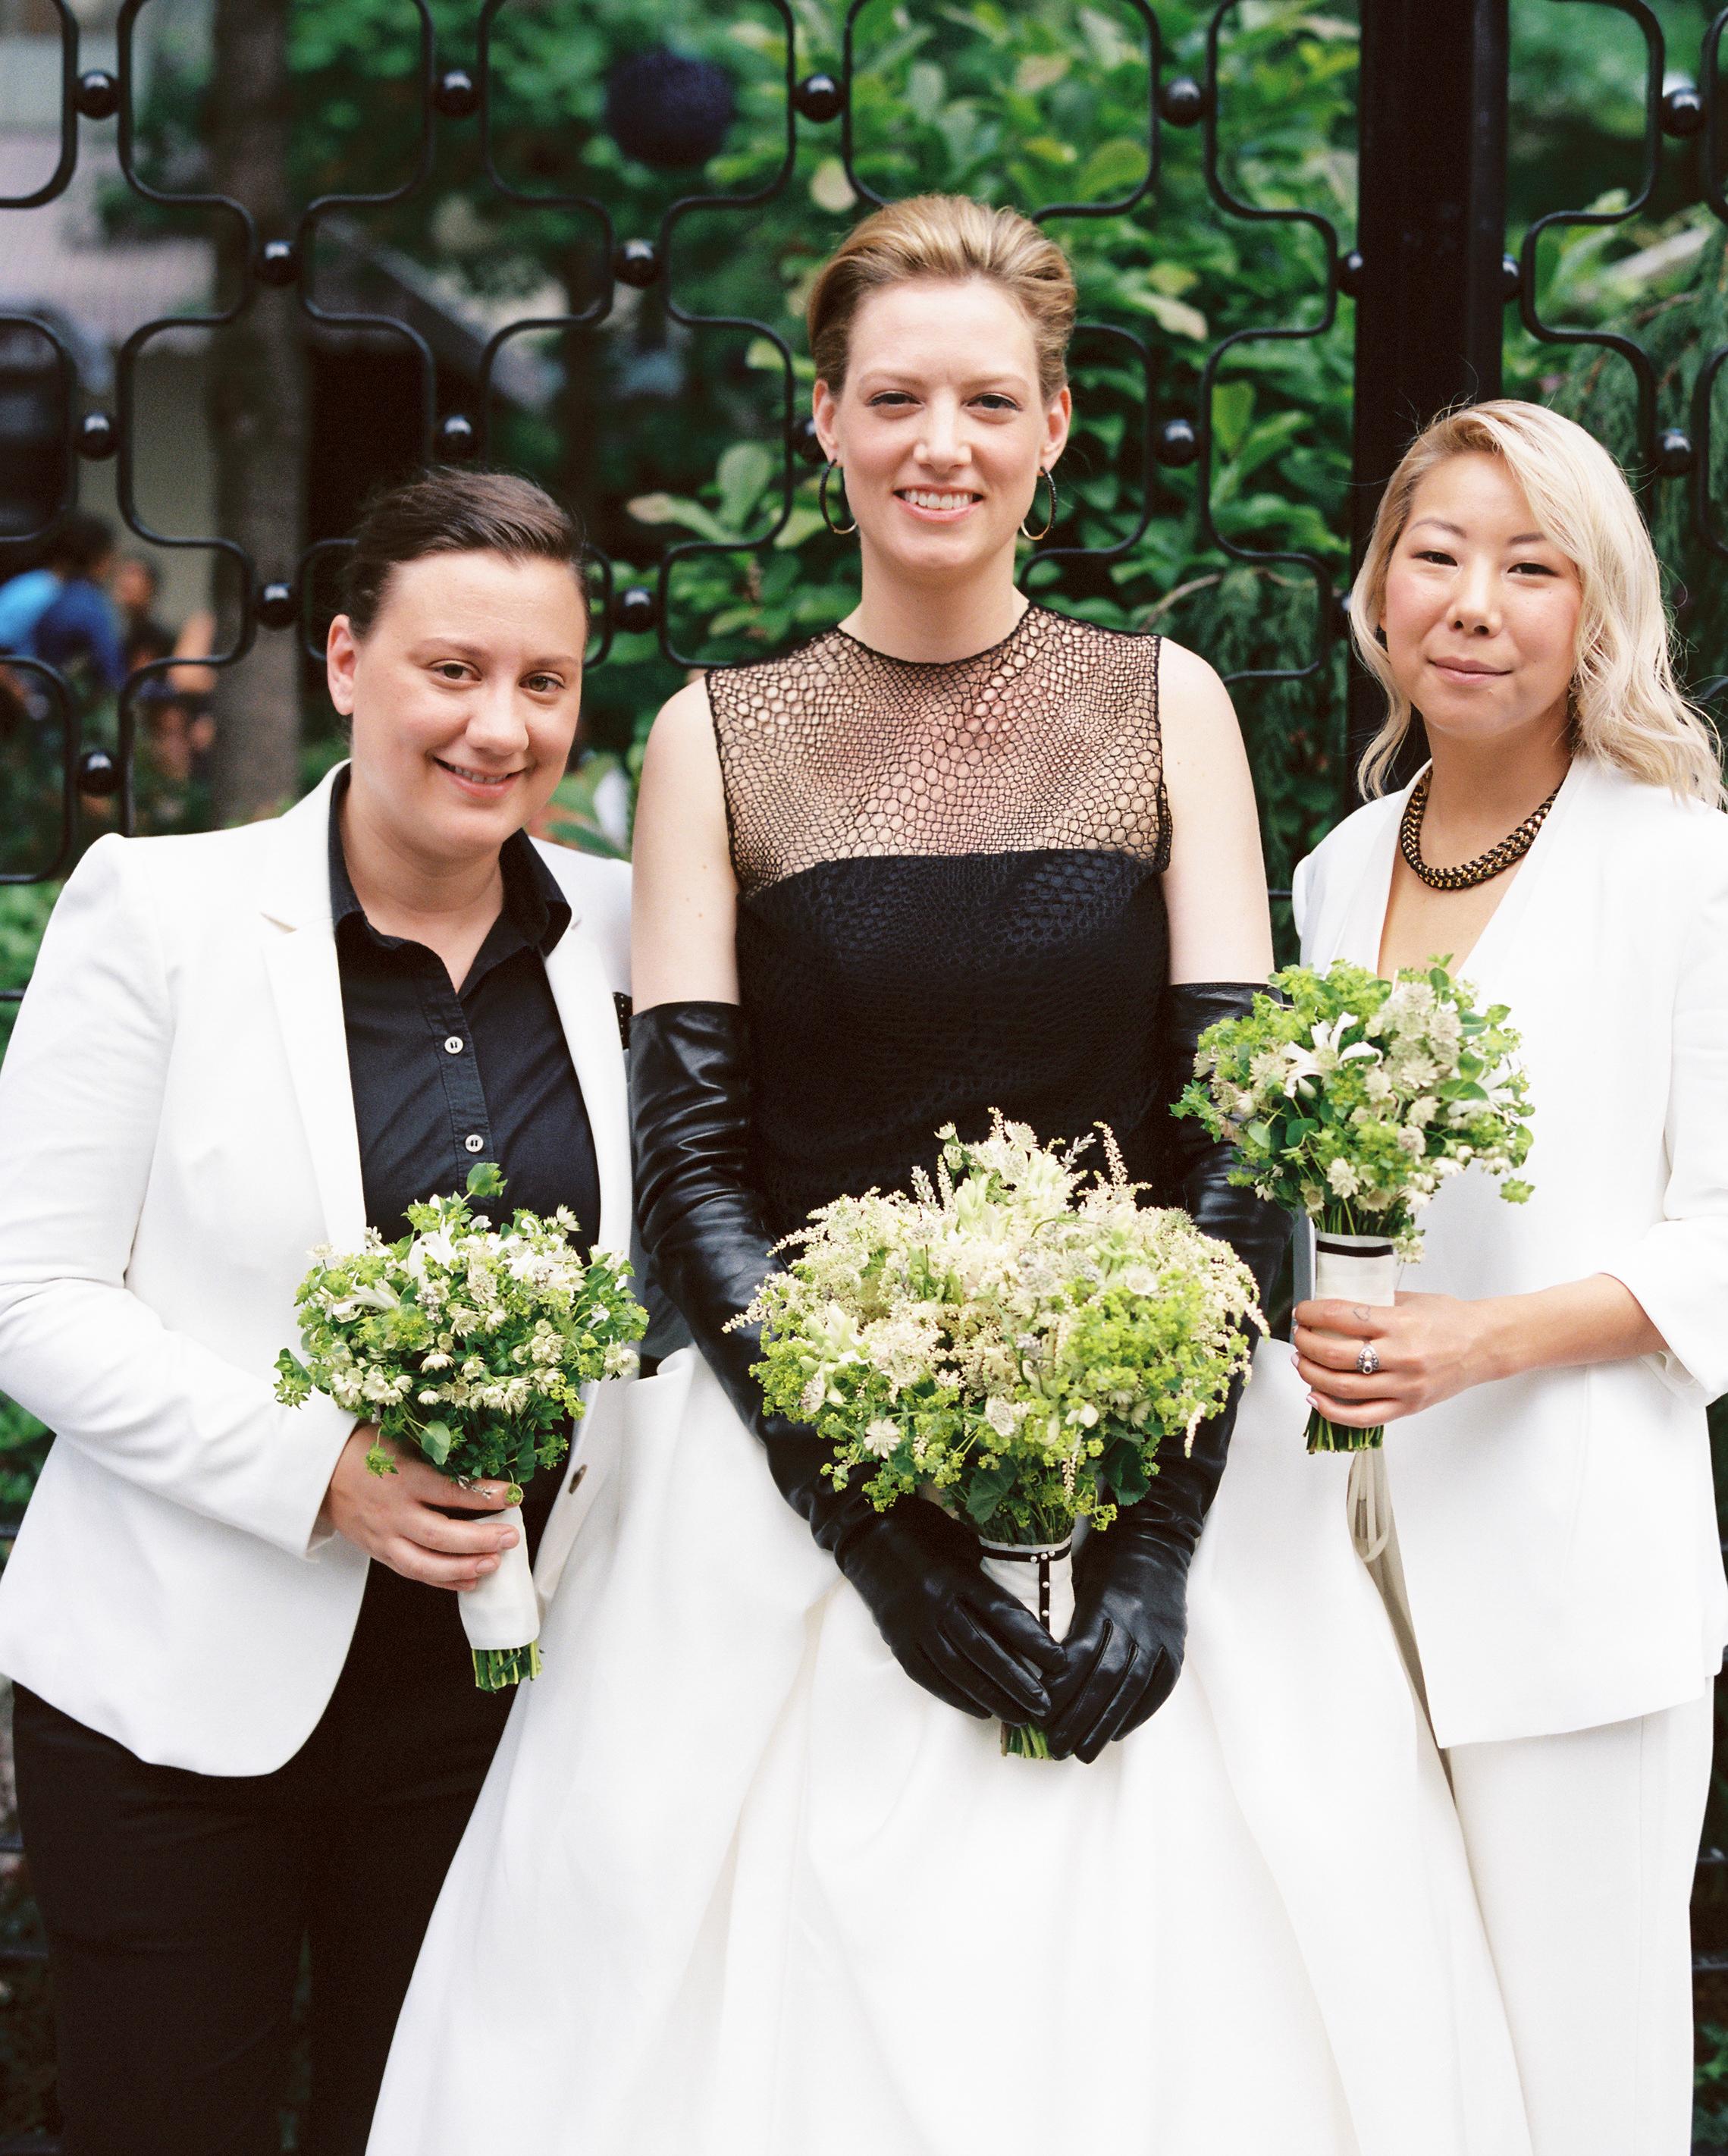 amy-sheldon-wedding-bridesmaids-0075-s112088-0815.jpg